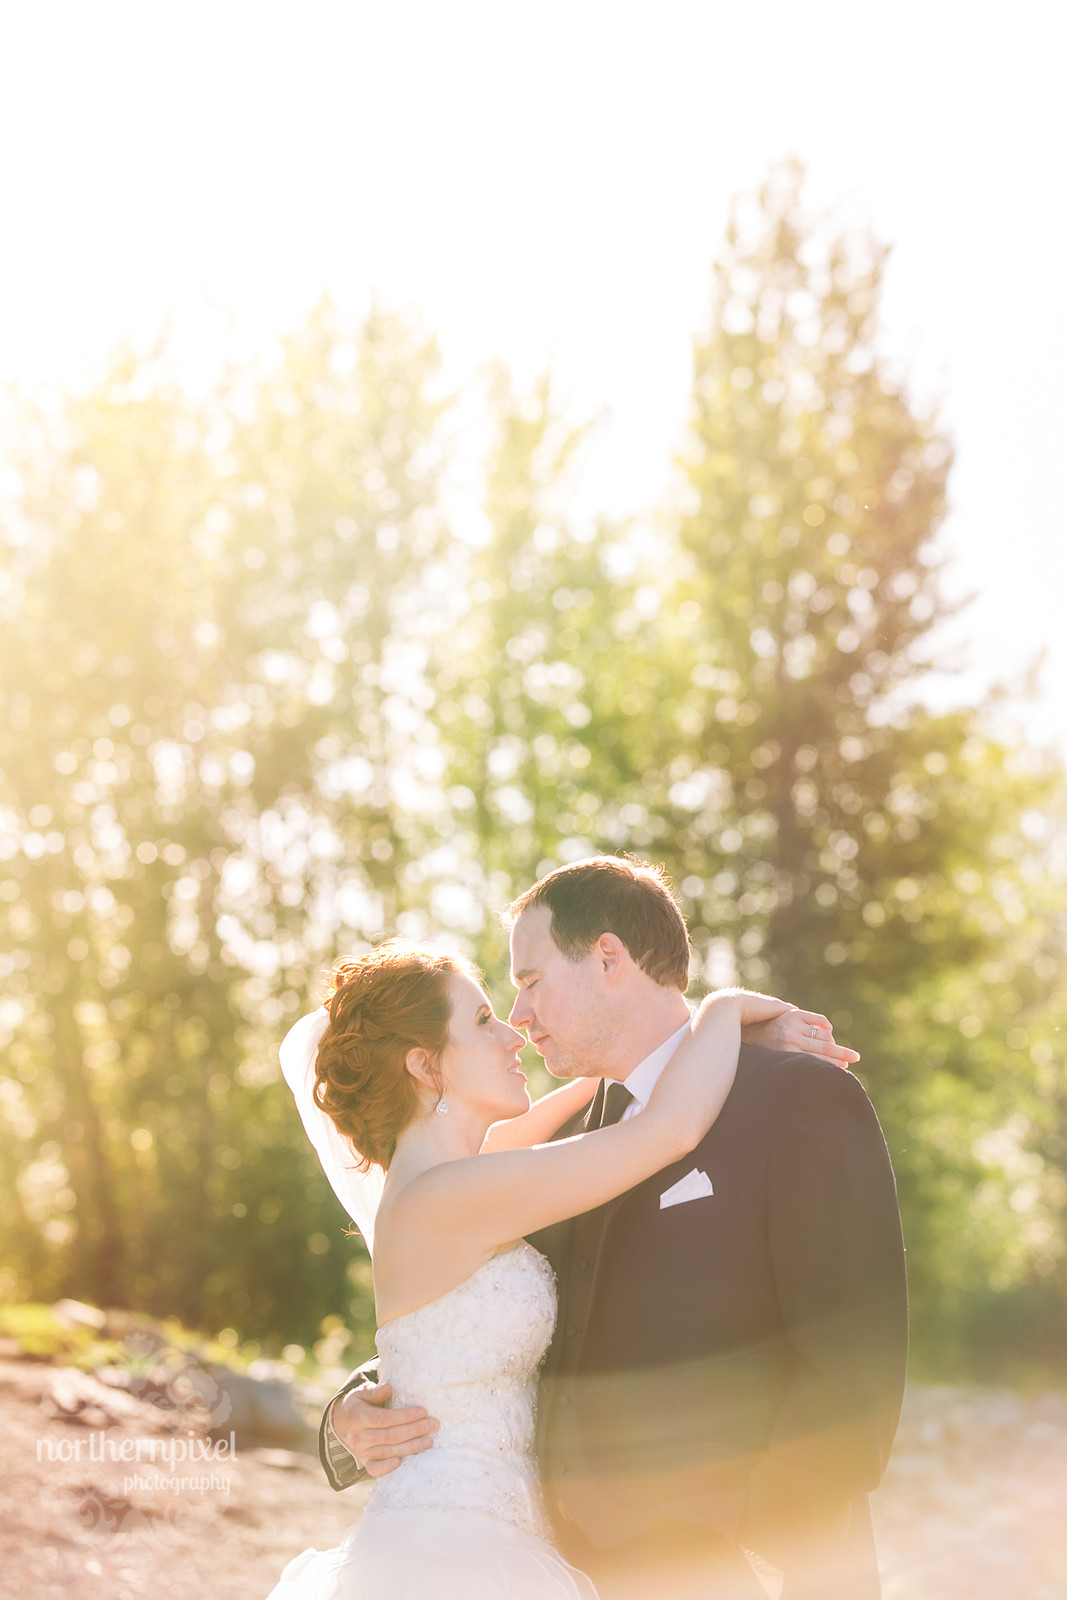 Kendra & Jarrett - Prince George BC Wedding